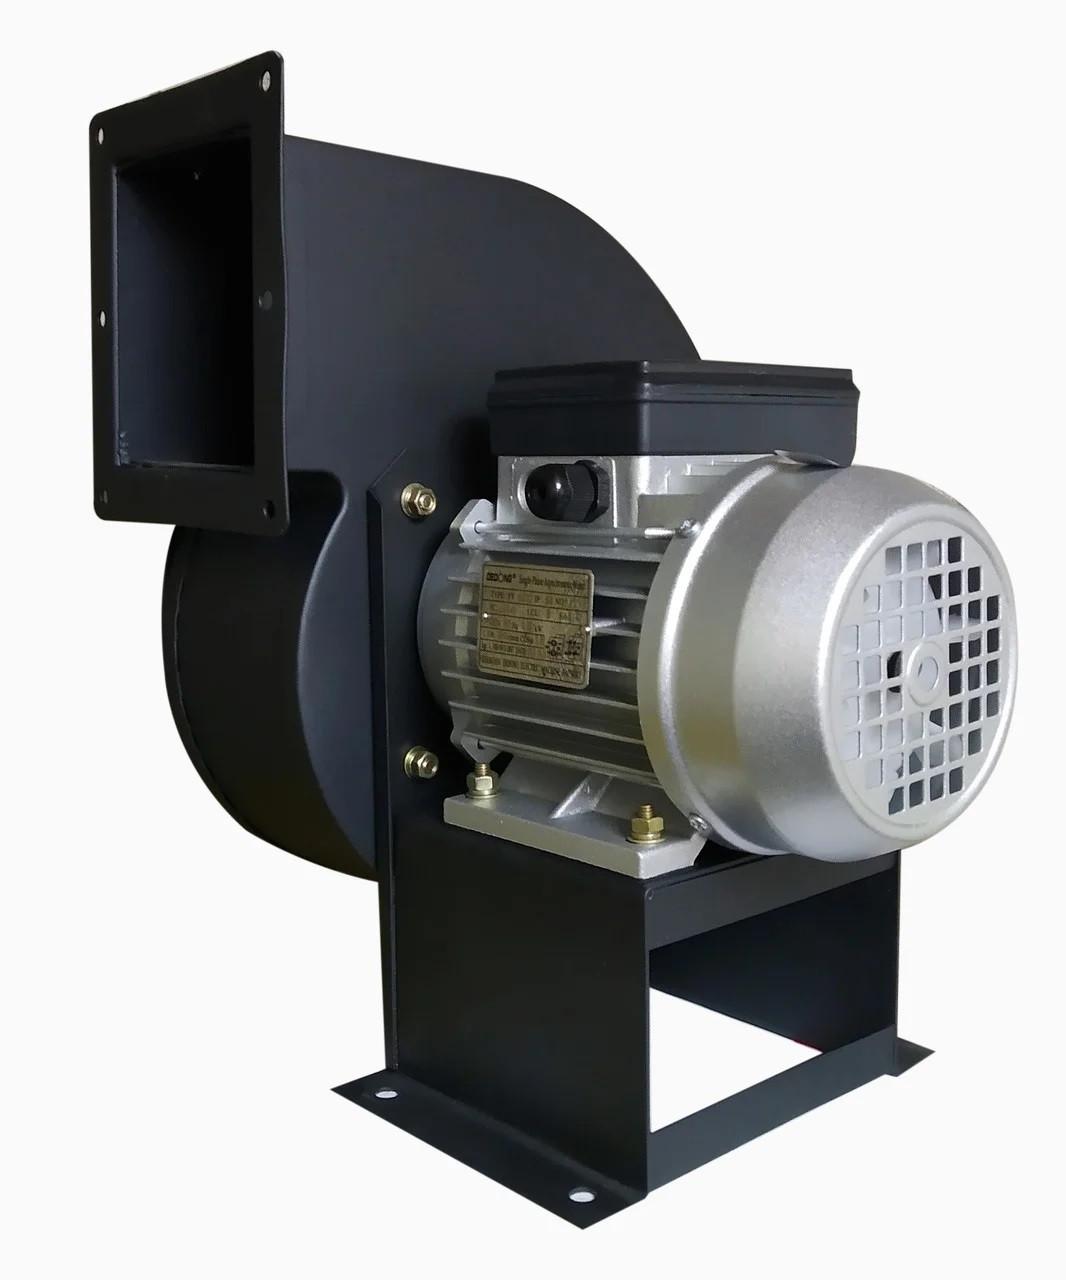 Вентилятор улитка центробежный Turbo DE 160 220В для турбо булерьяна